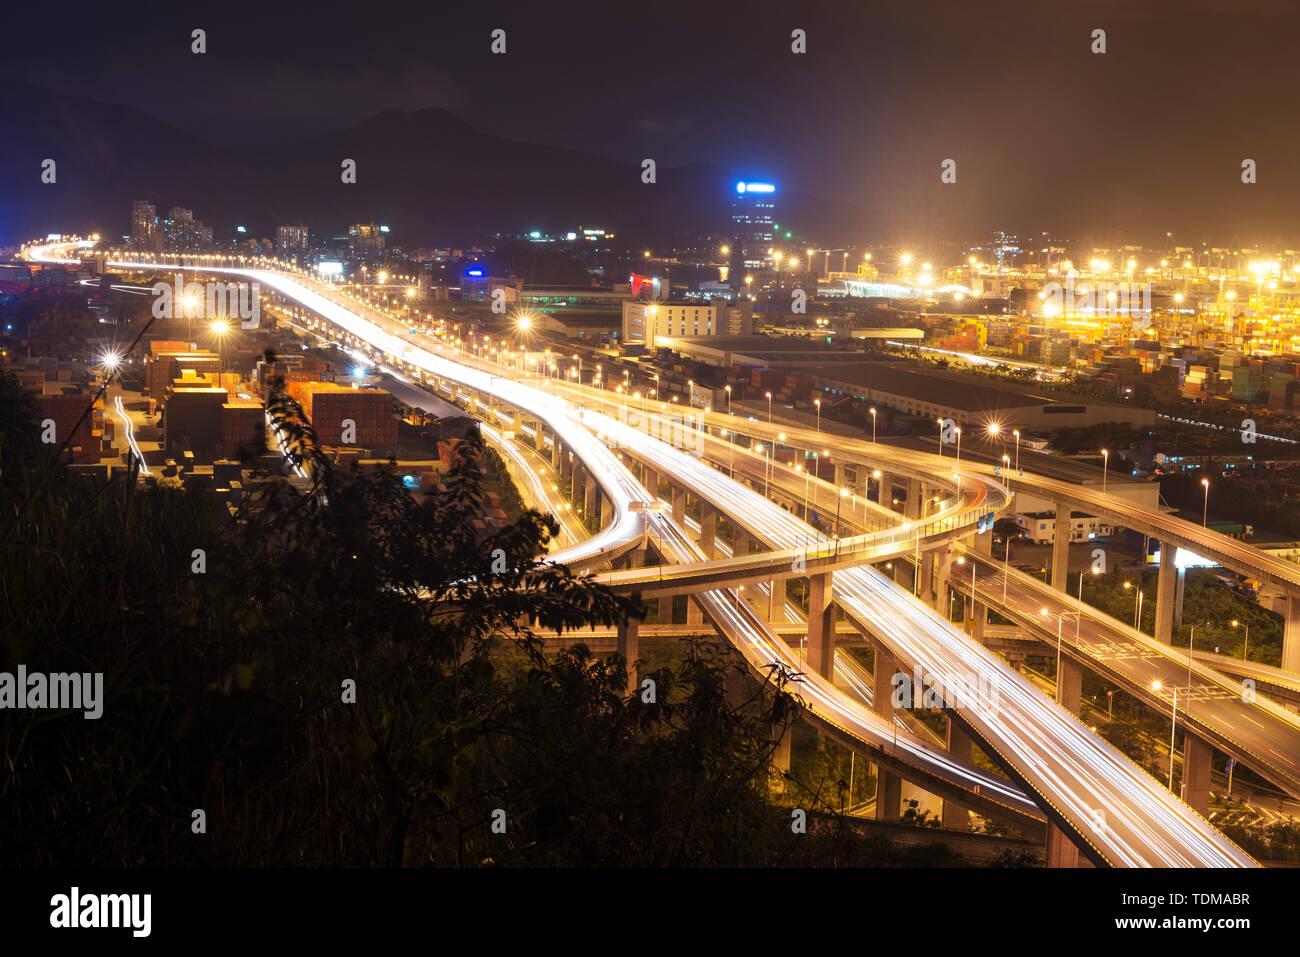 Illuminated and elevated expressway and cityscape at night Stock Photo